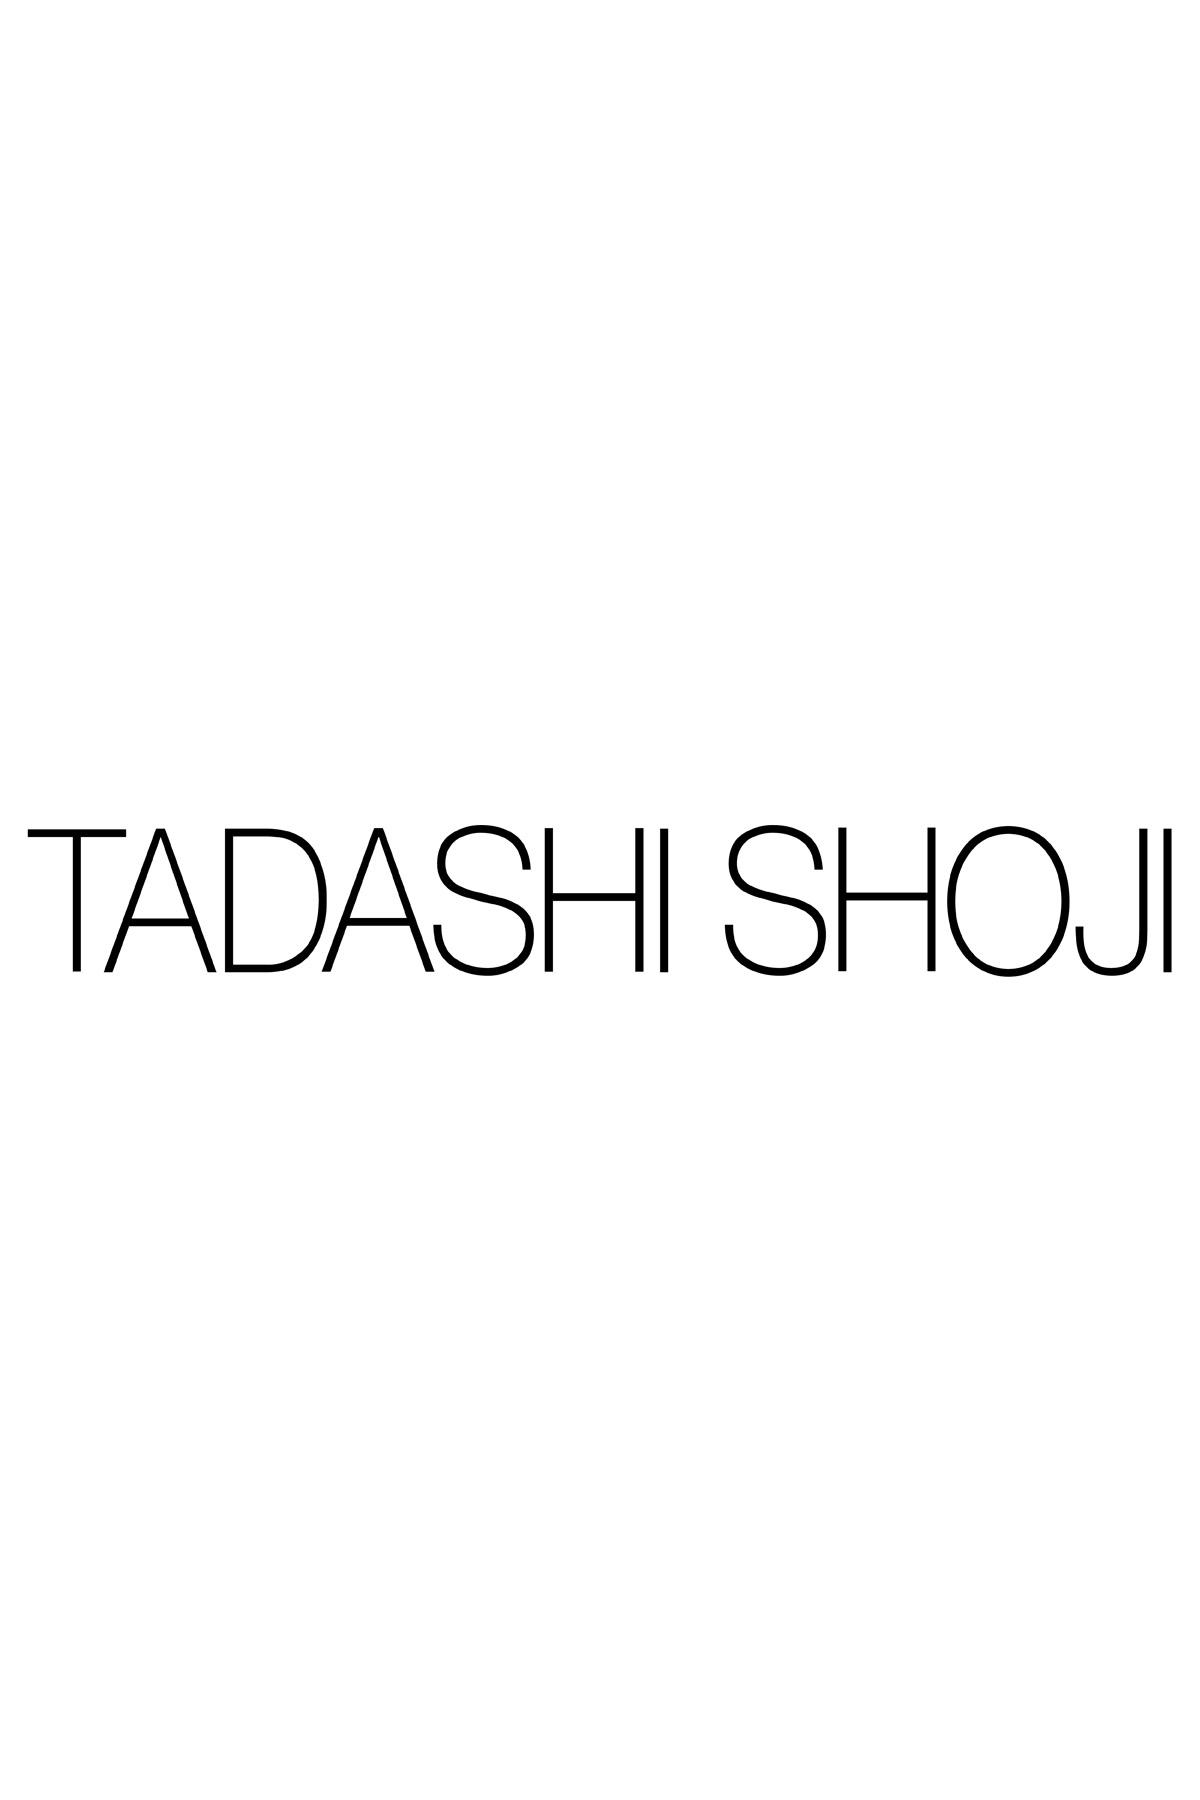 Tadashi Shoji - Jewel Embellished Lace Box Clutch